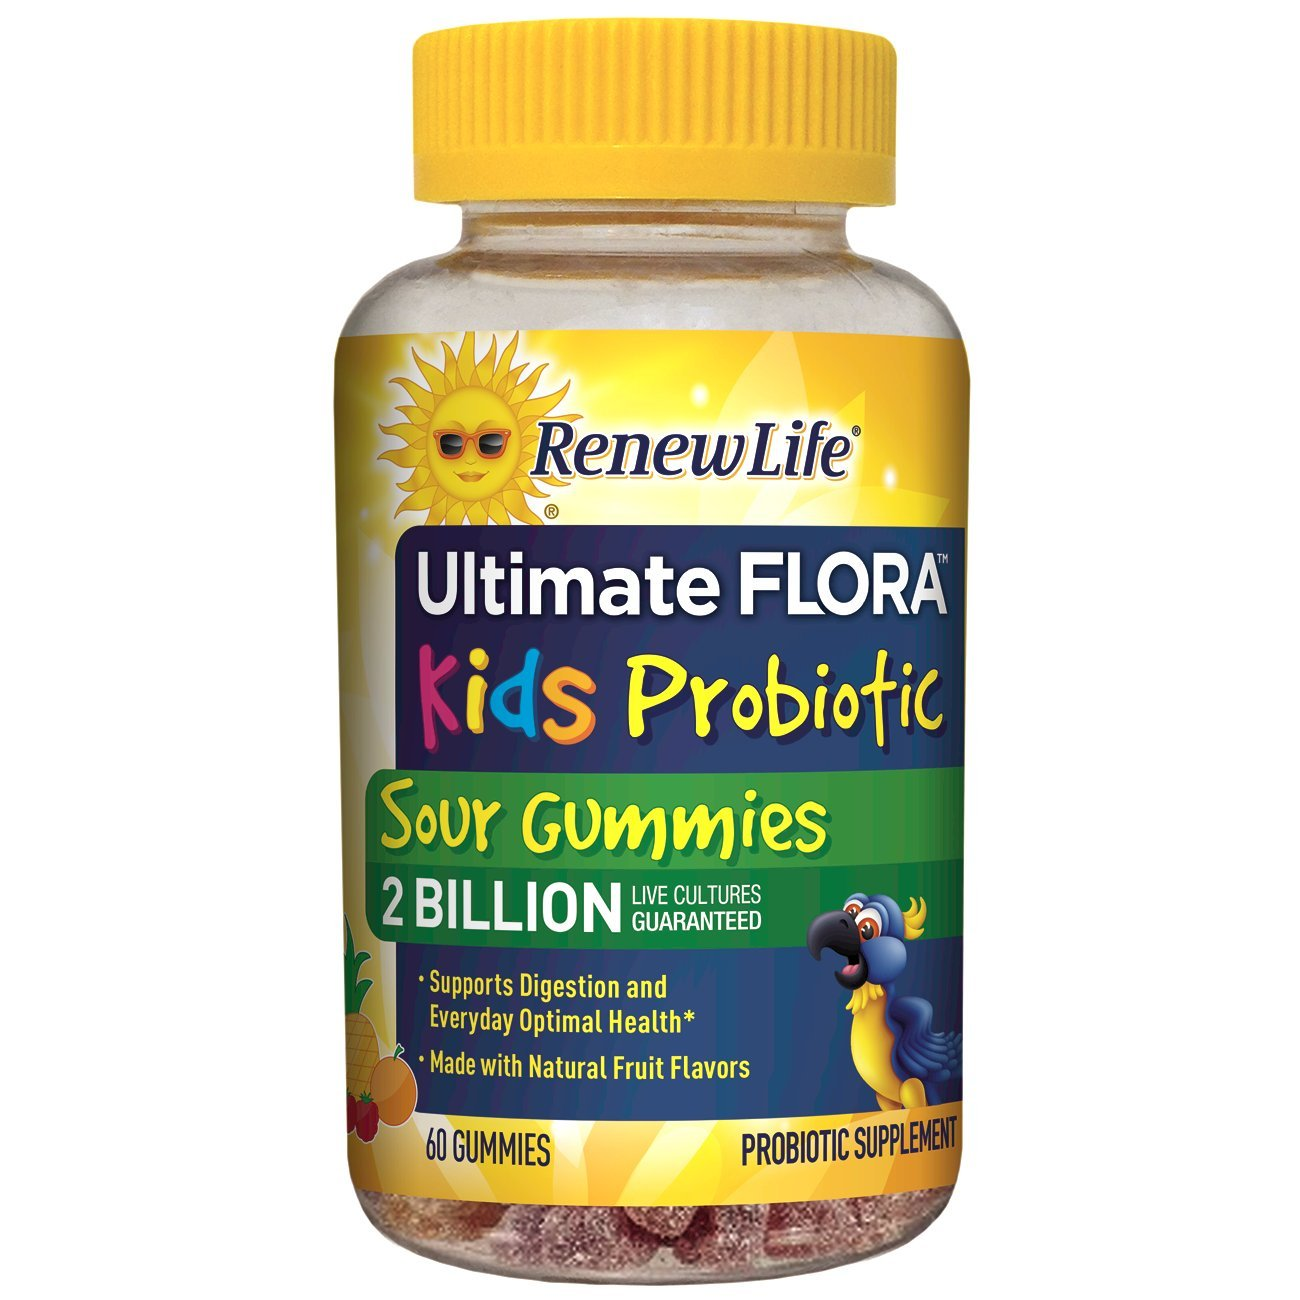 Renew Life - Ultimate Flora Probiotic Sour Gummies - probiotics for kids and adults - 60 chewable sour gummies